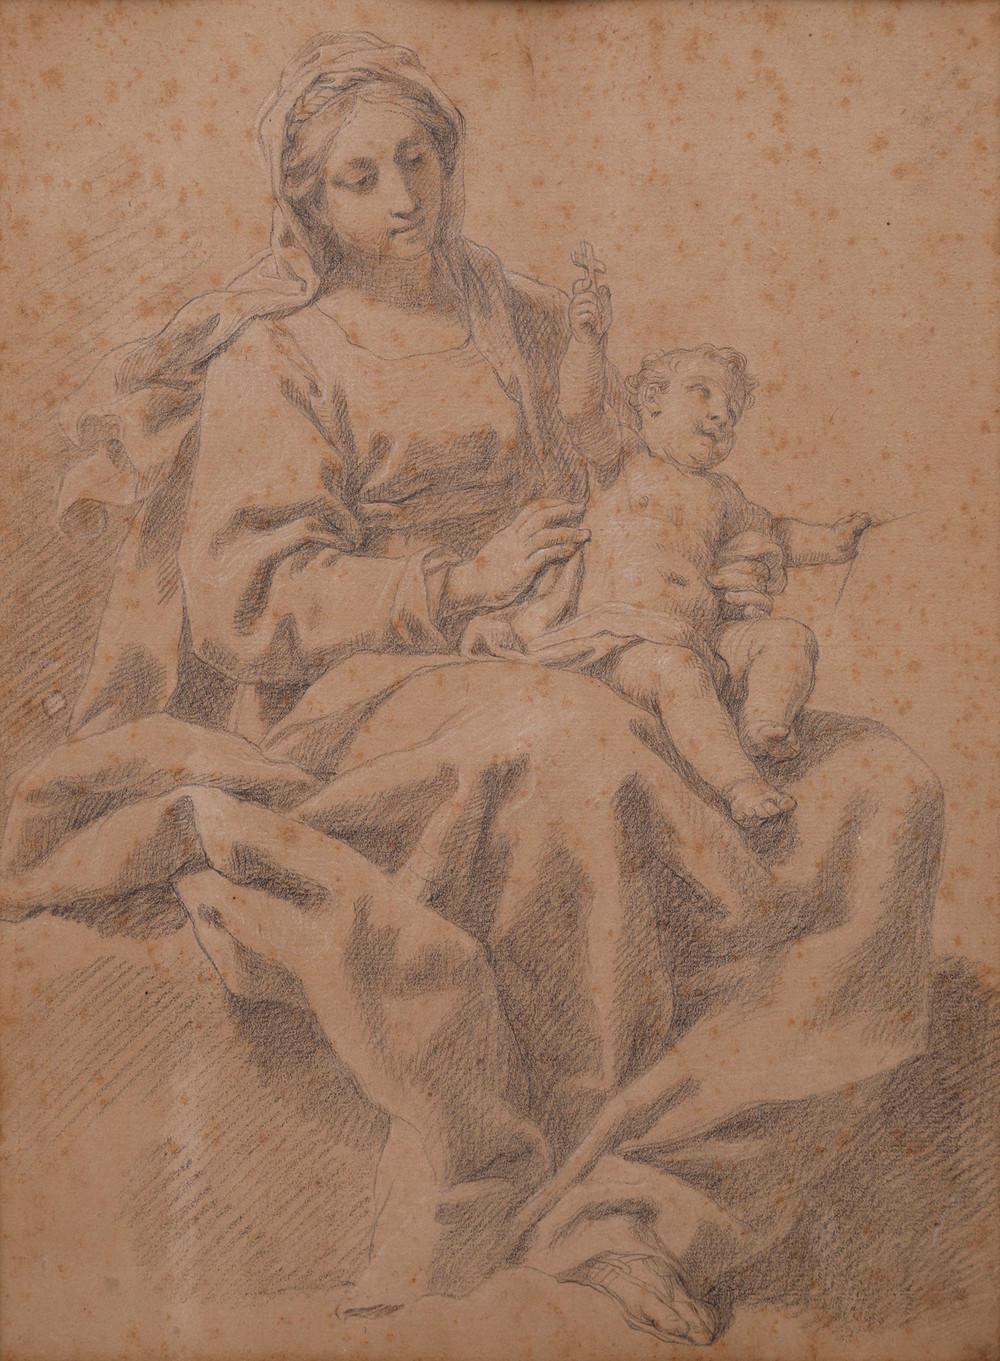 GAETANO GANDOLFI. Attributed to. Madonna and Child.